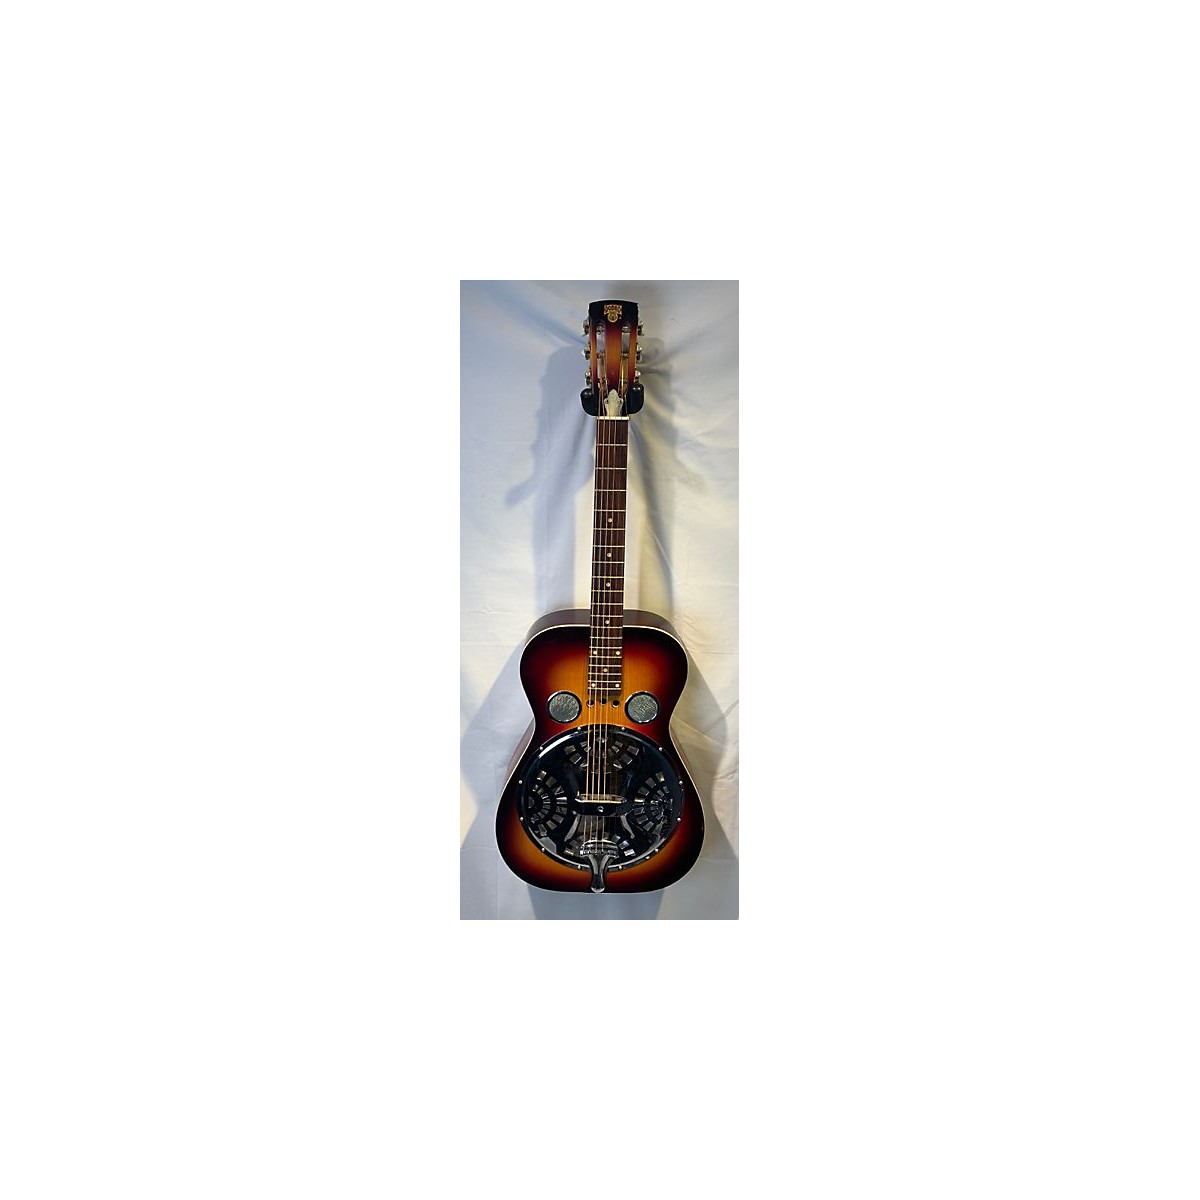 Dobro 1980 MODEL 60D Resonator Guitar